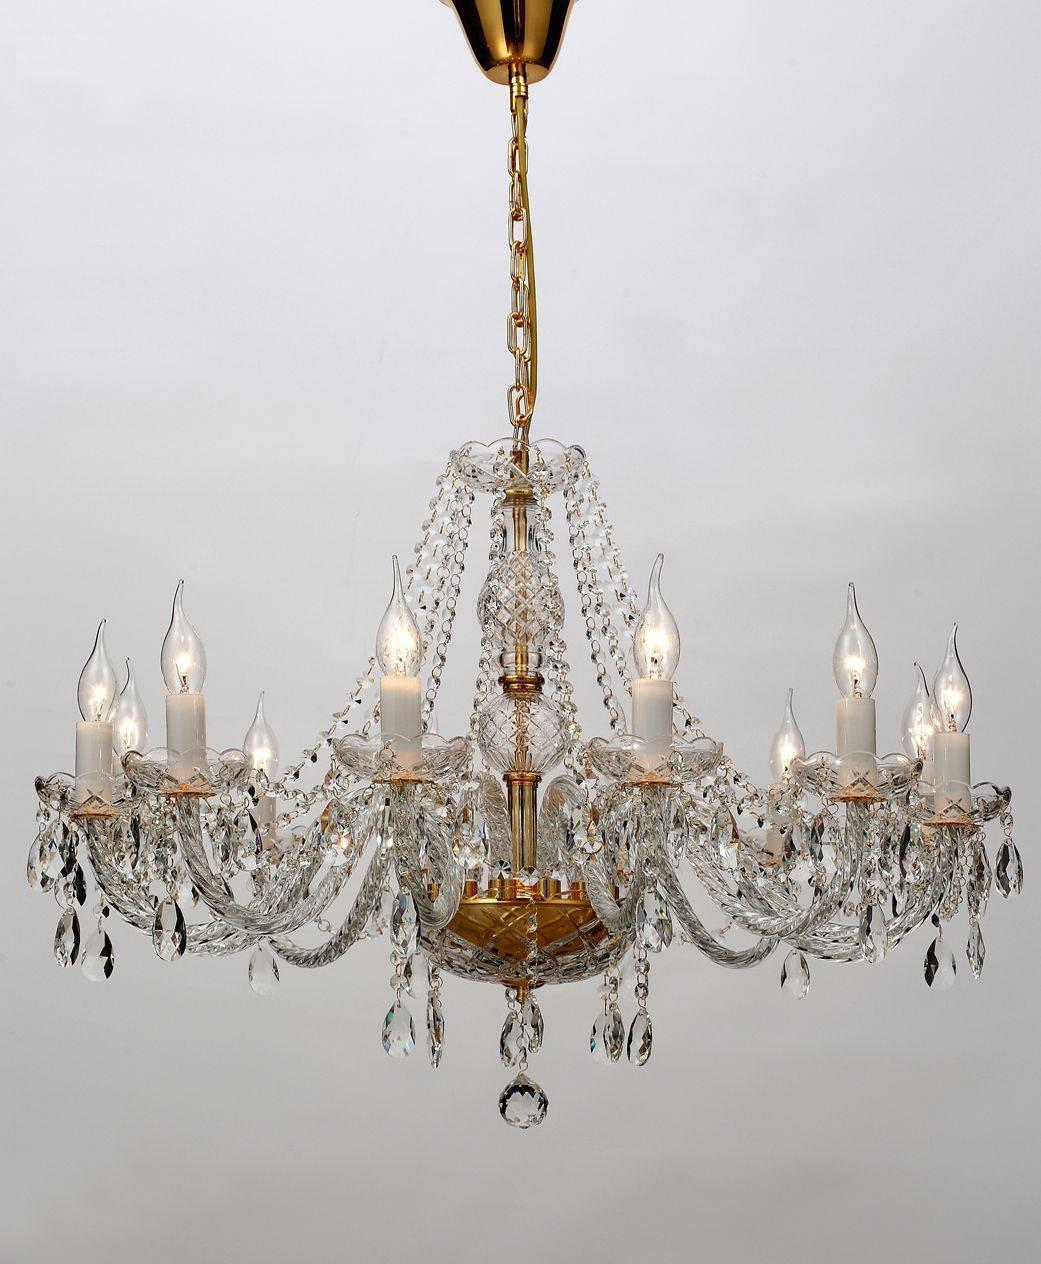 Люстра Favourite Monreal 1735-12P подвесная подвесная люстра 1735 12p favourite хрустальная люстра